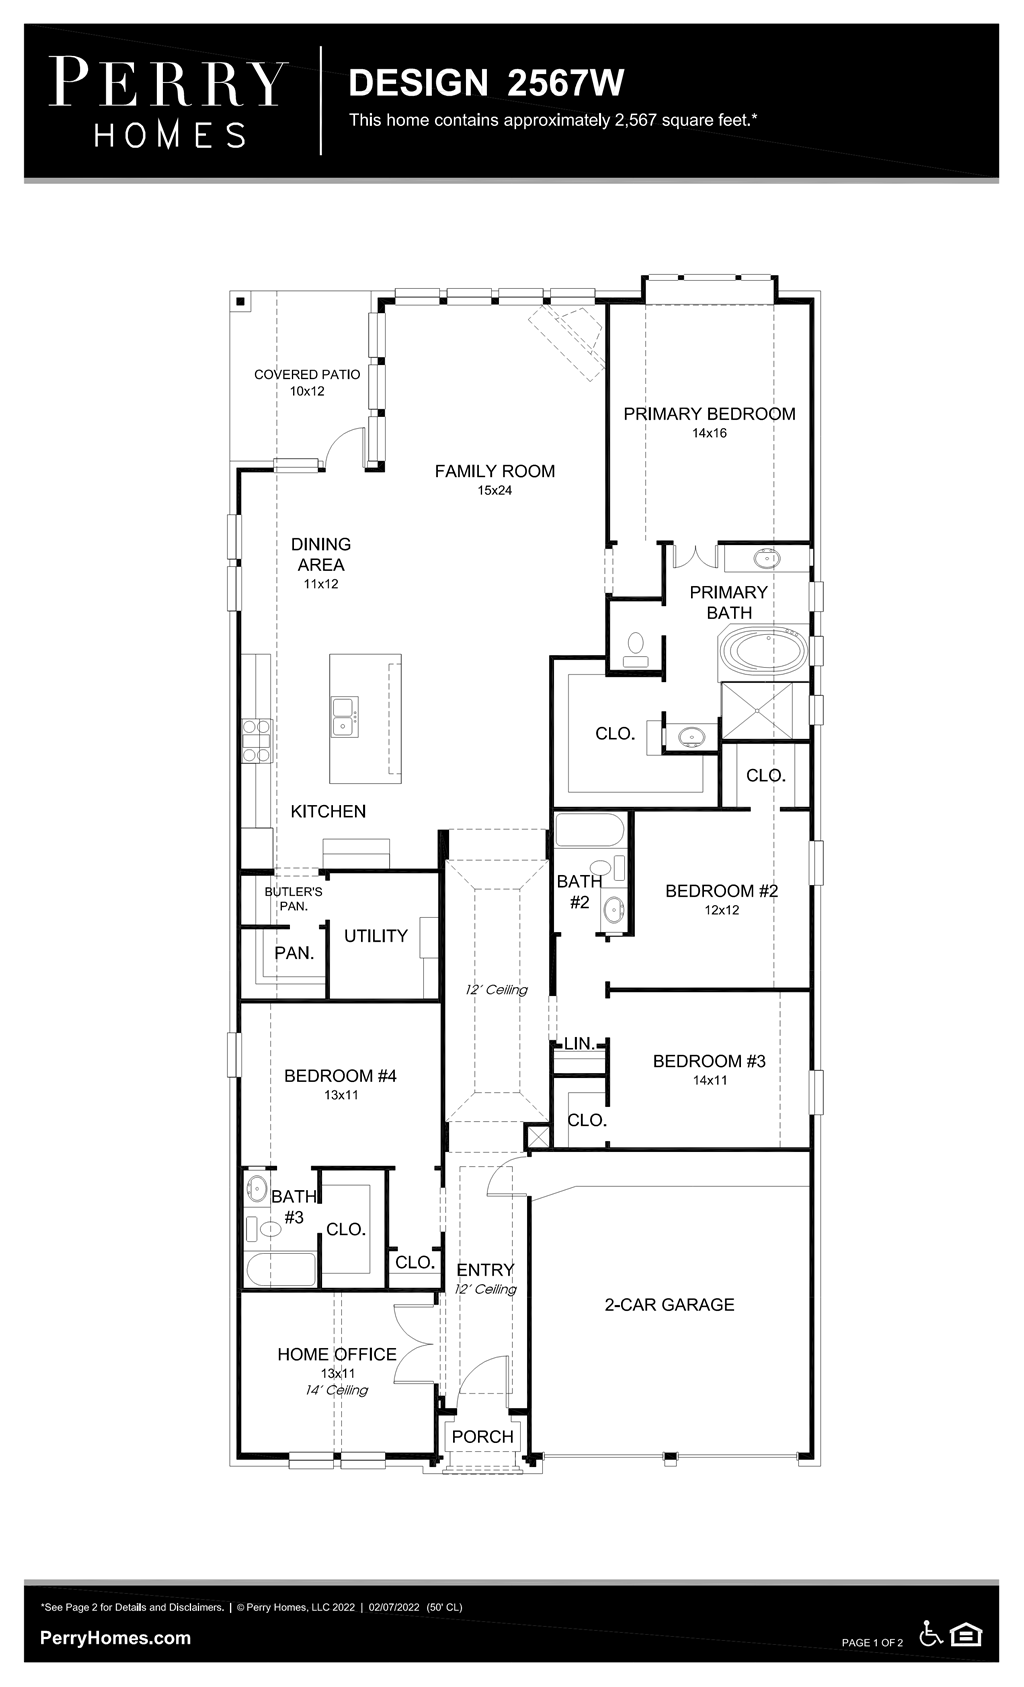 Floor Plan for 2567W